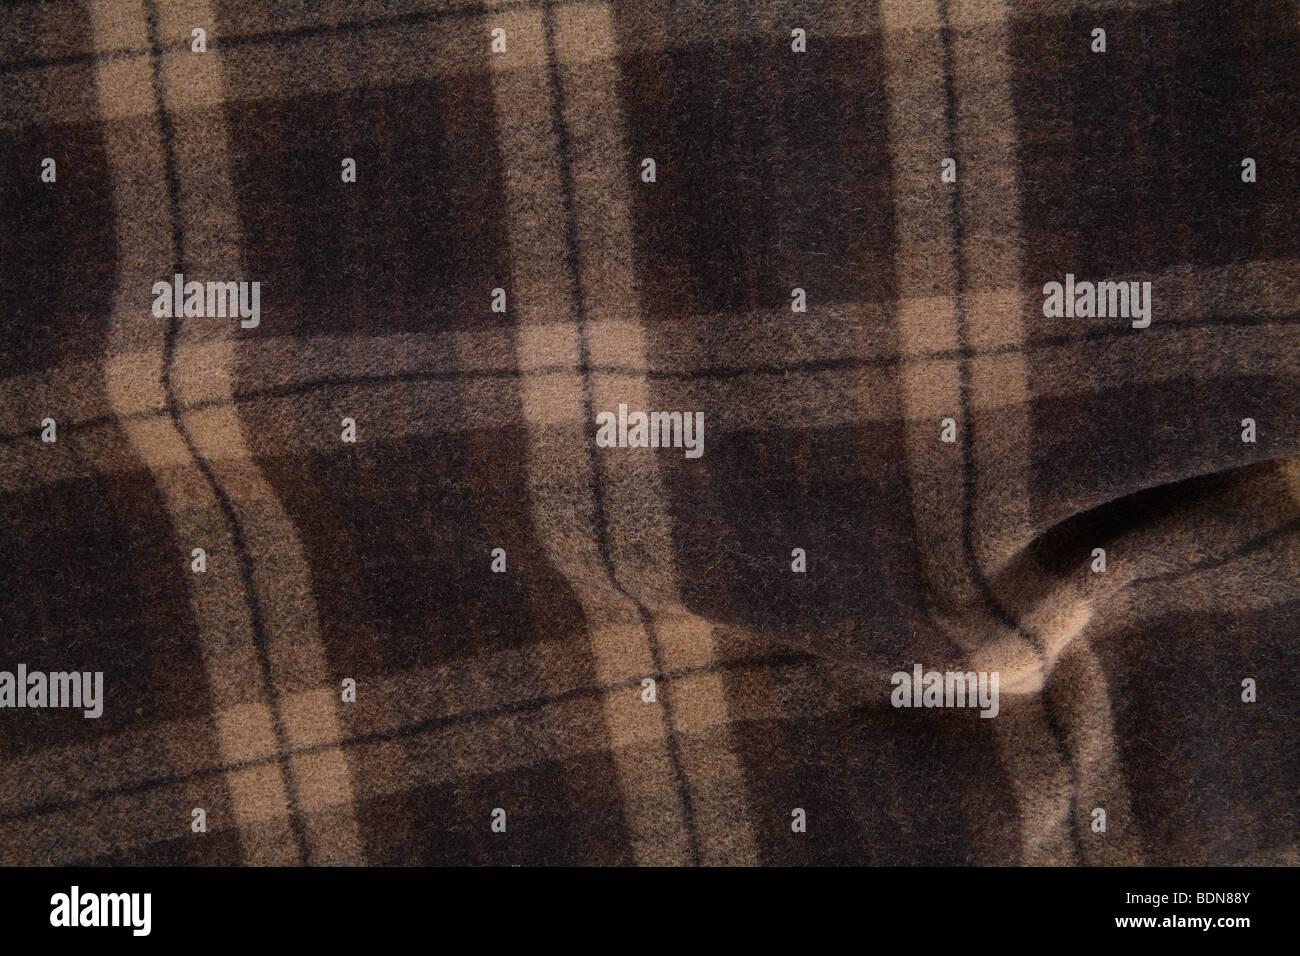 Plaid flannel - Stock Image